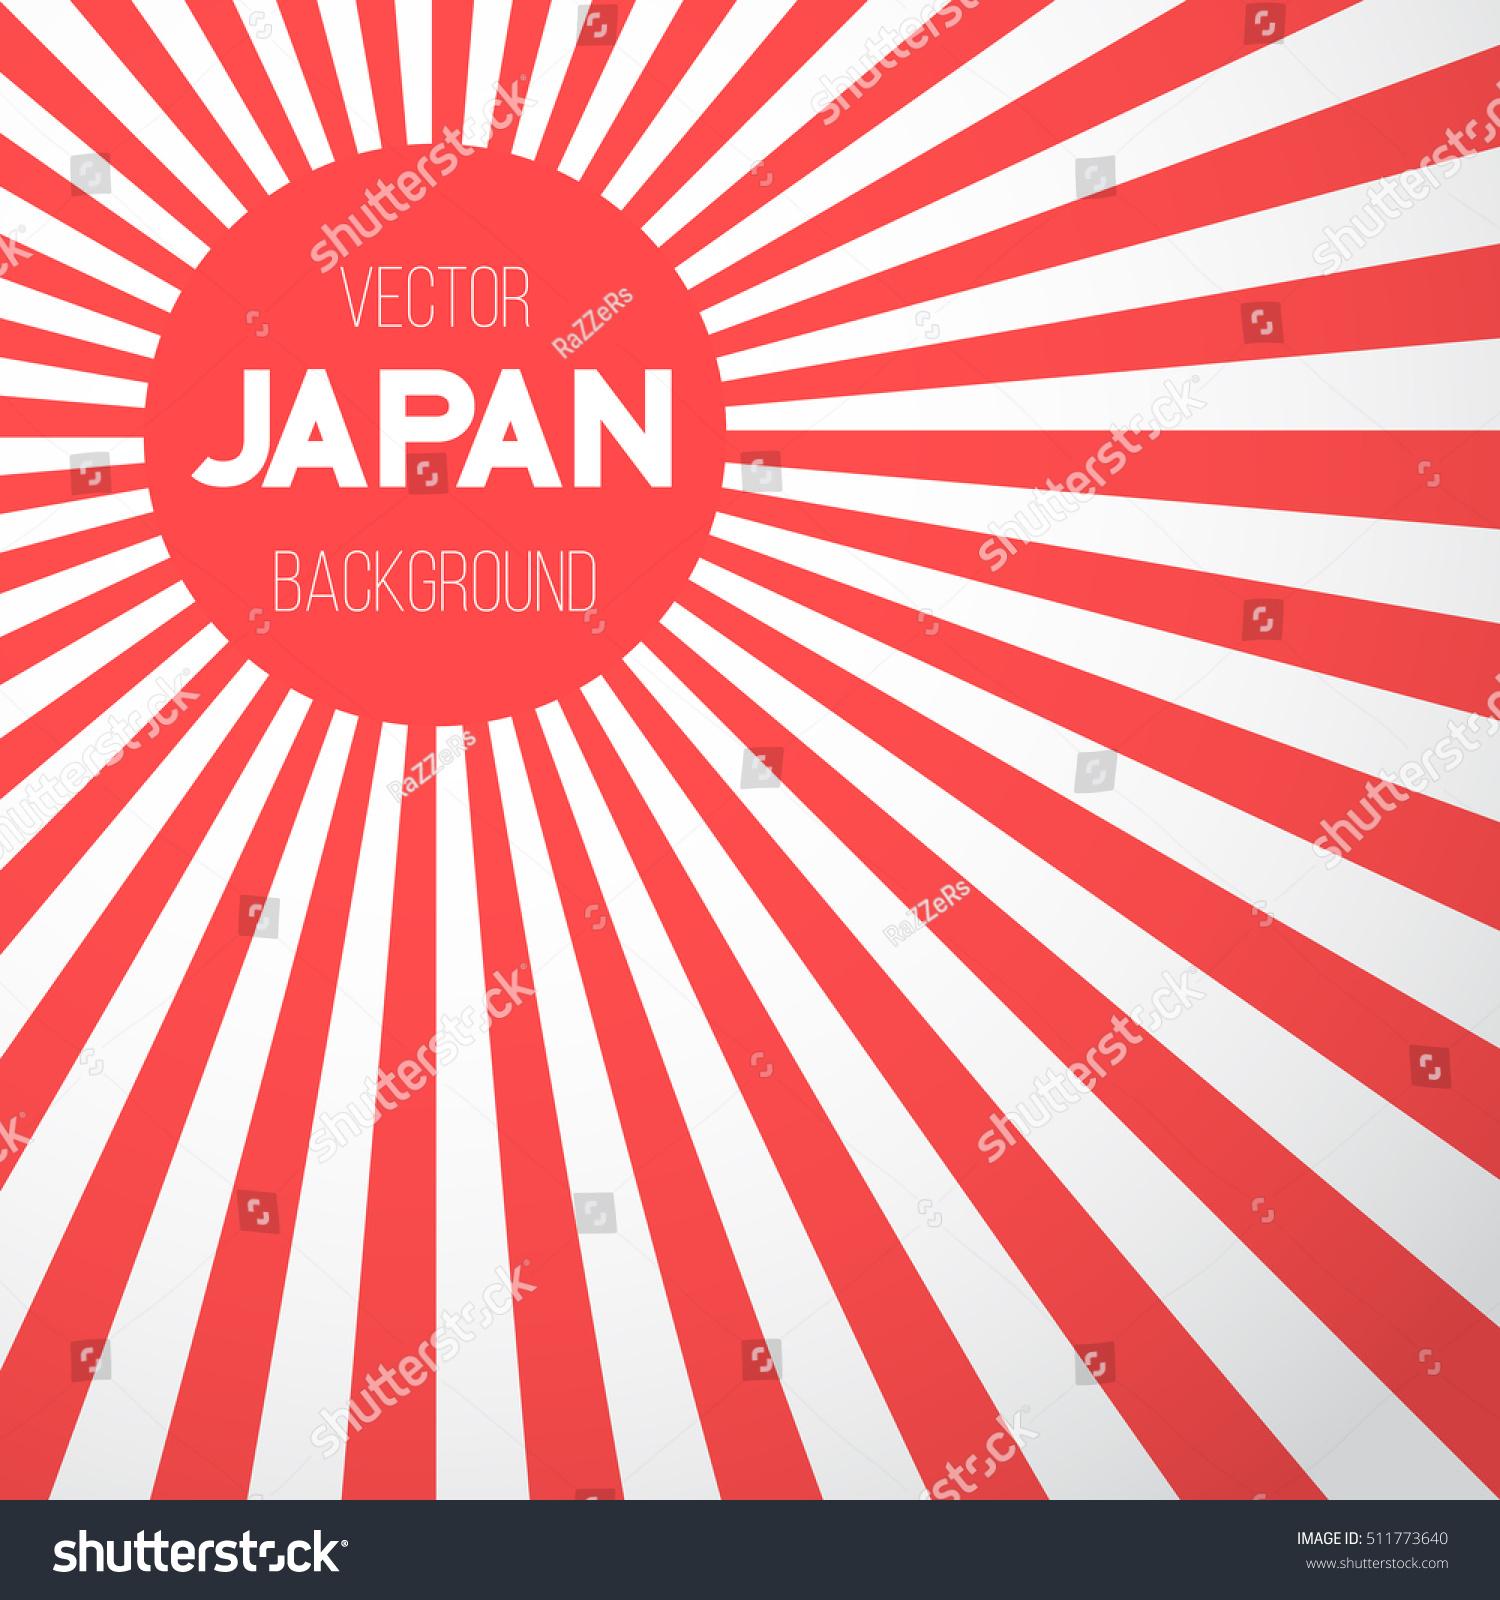 Japanese flag template quantumgaming illustration japan flag vector background retro stock vector powerpoint templates toneelgroepblik Images